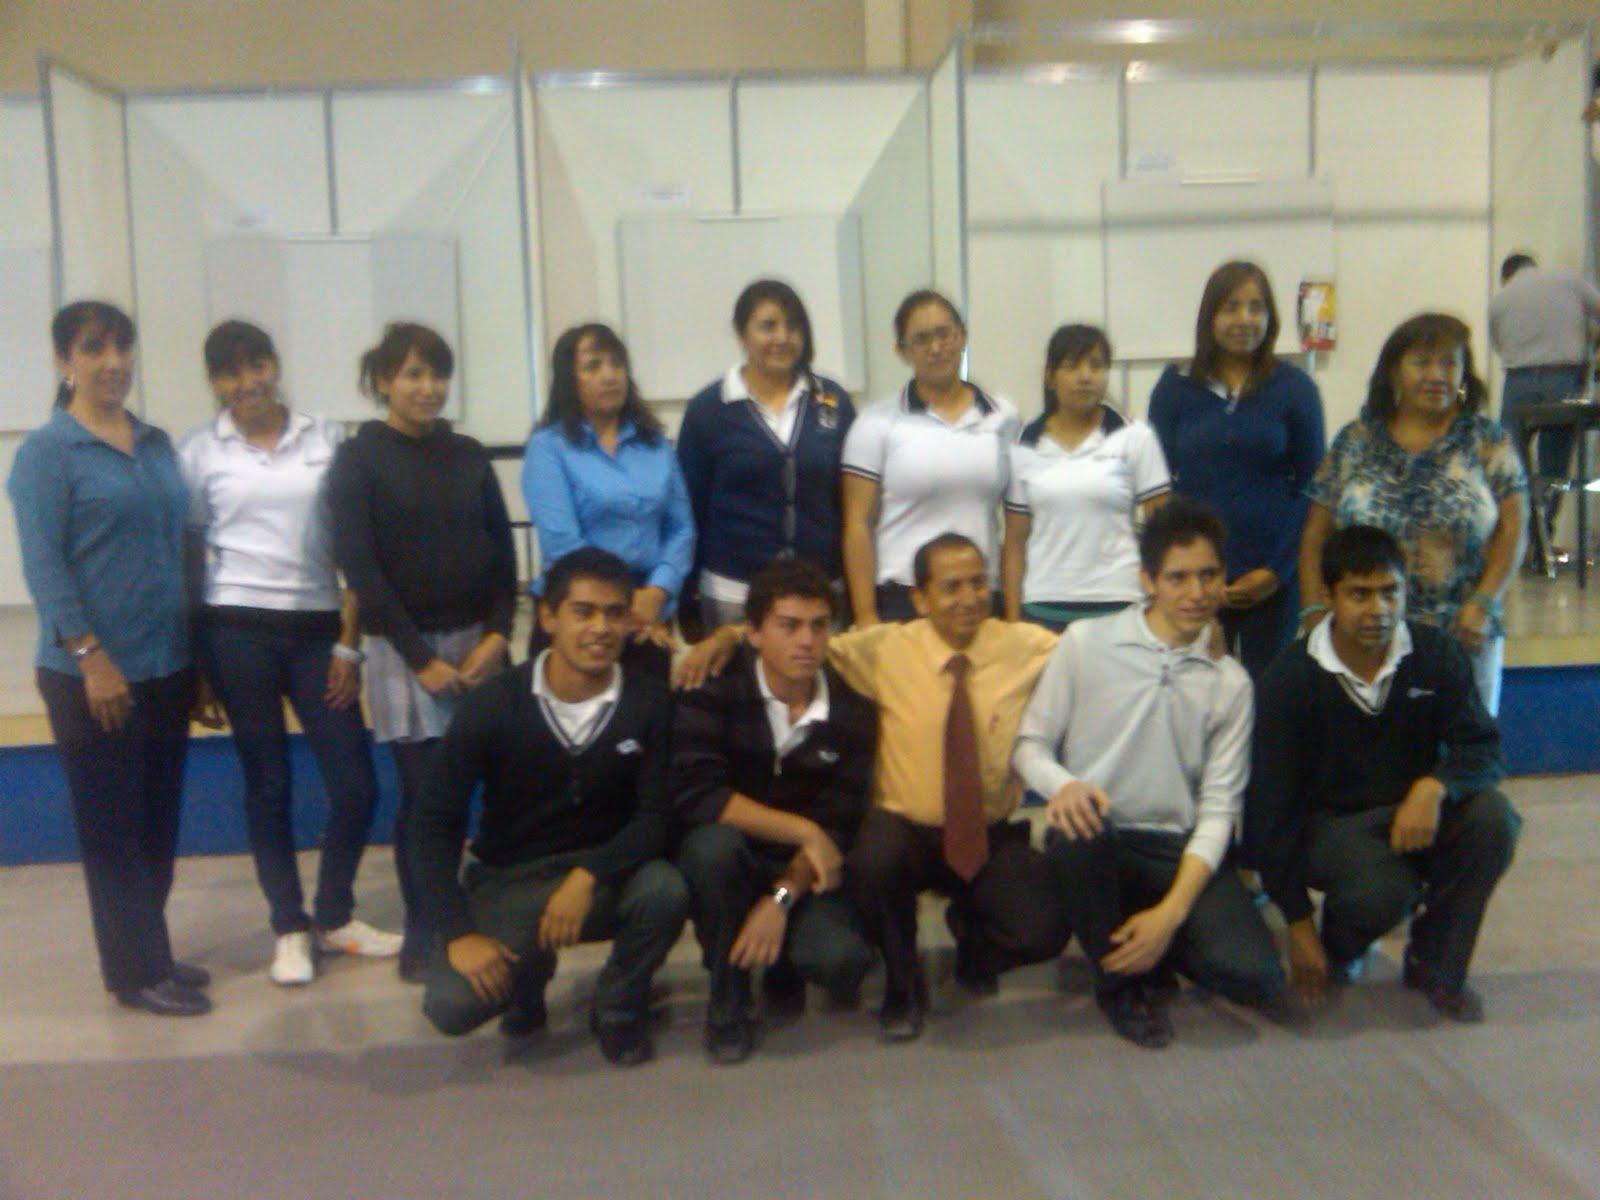 Instituto Tecnológico de León Guanajuato - Photos